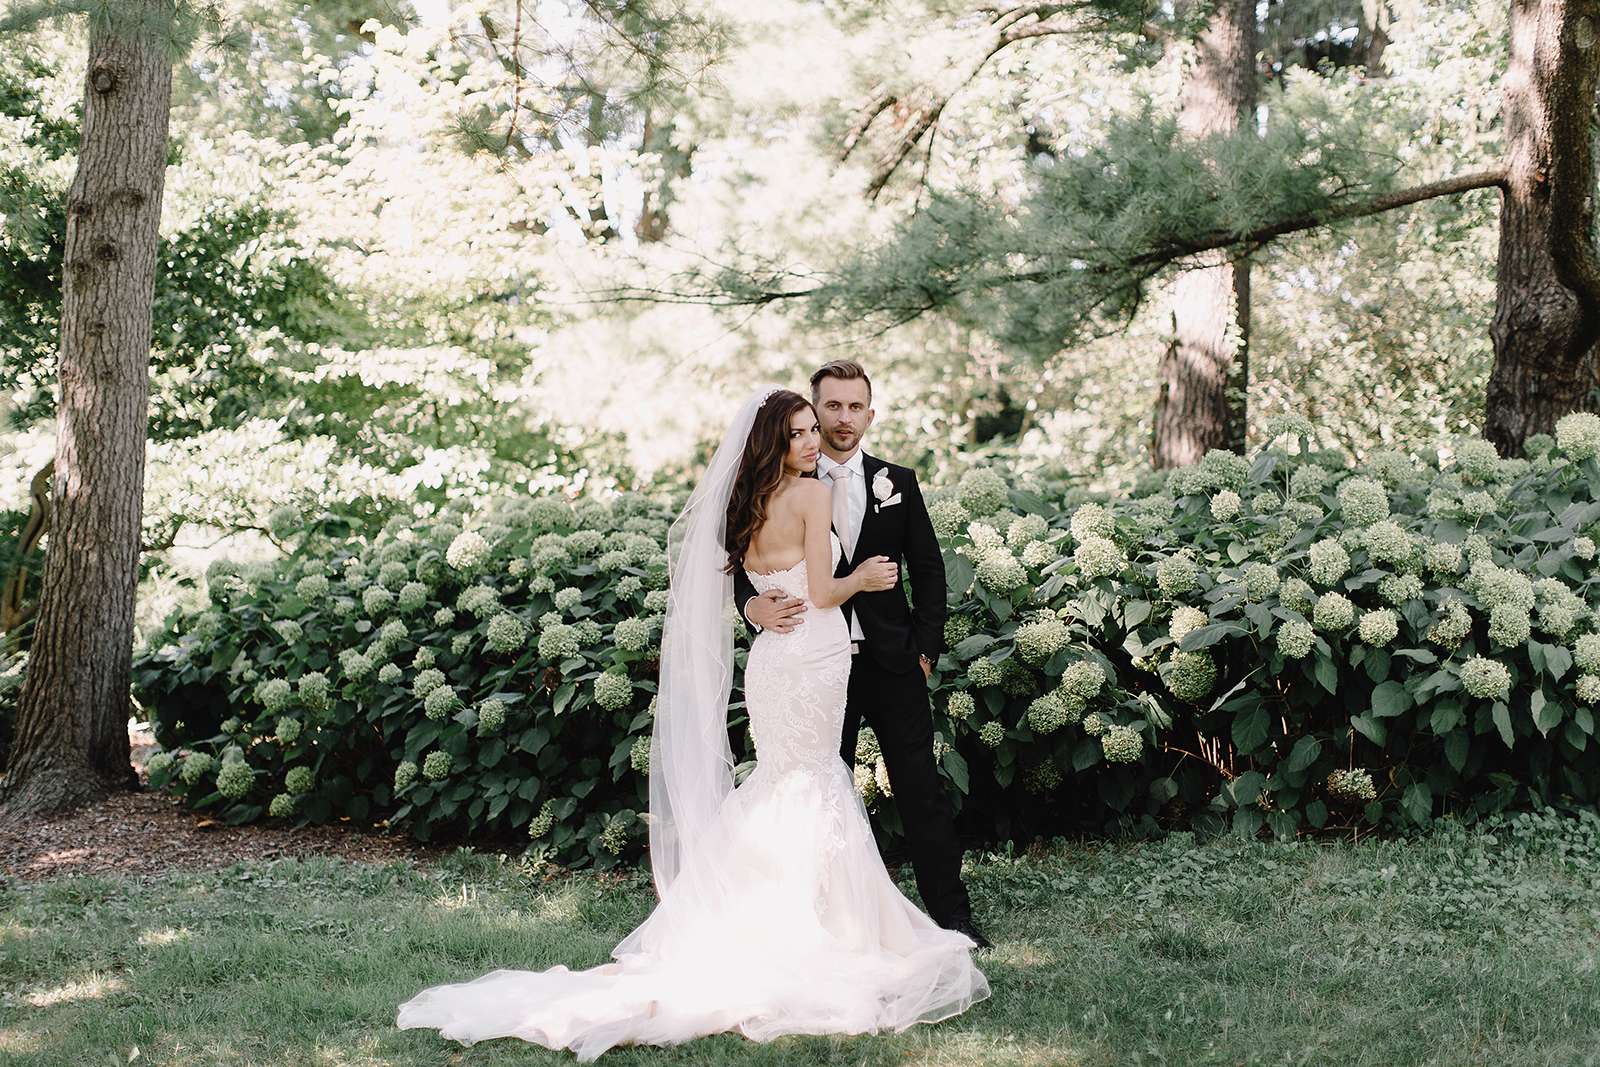 anxhela_taulant_chicago_morton_arboretum_lisle_illinois_outdoor_garden_ceremony_tent_reception_white_blue_pink_albanian_wedding_023.jpg